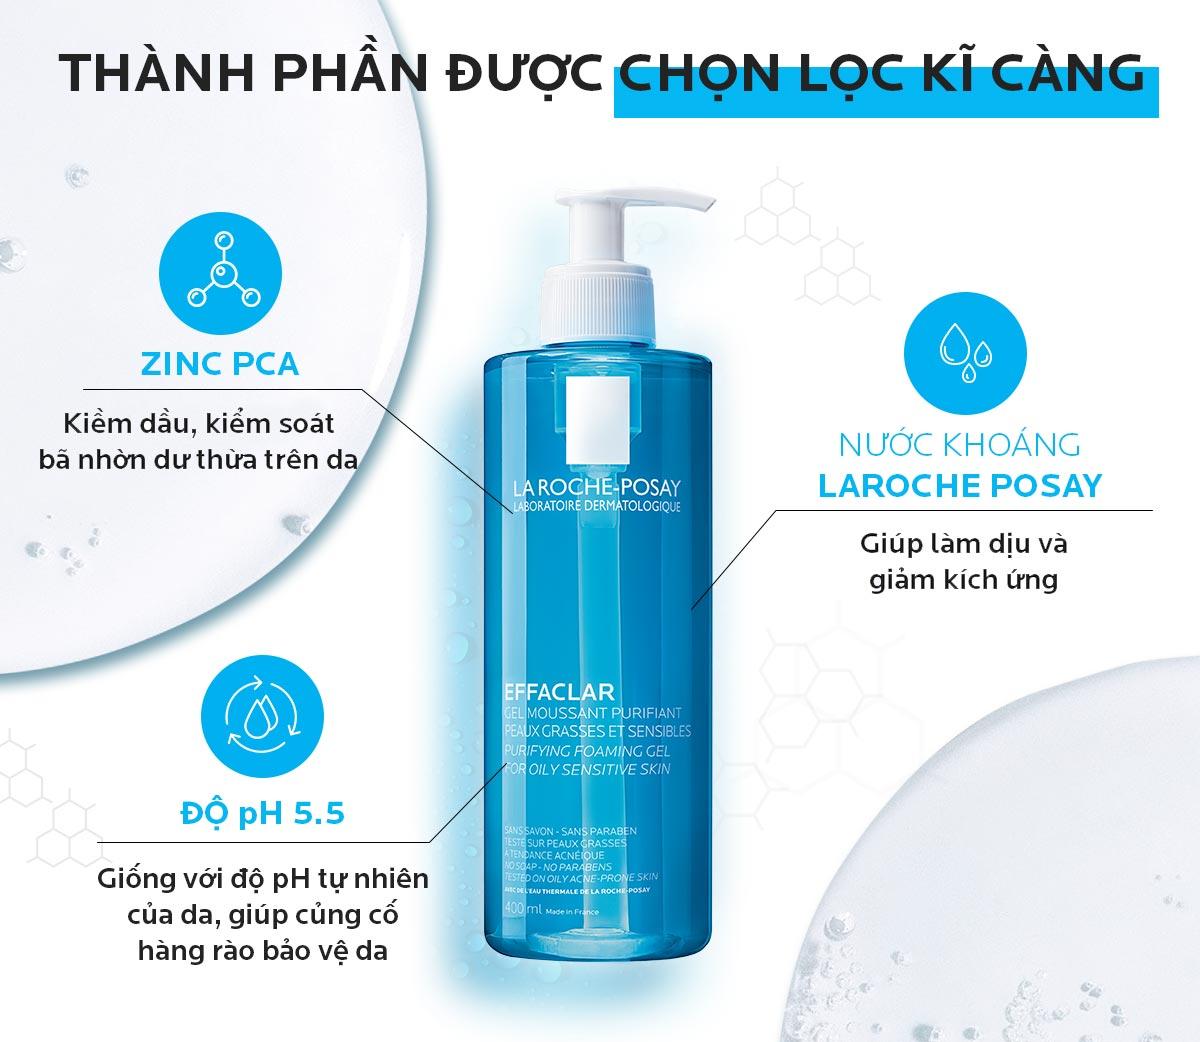 La Roche-Posay Effaclar Purifying Foaming Gel For Oily Sensitive Skin hiện đã có mặt tại Hasaki